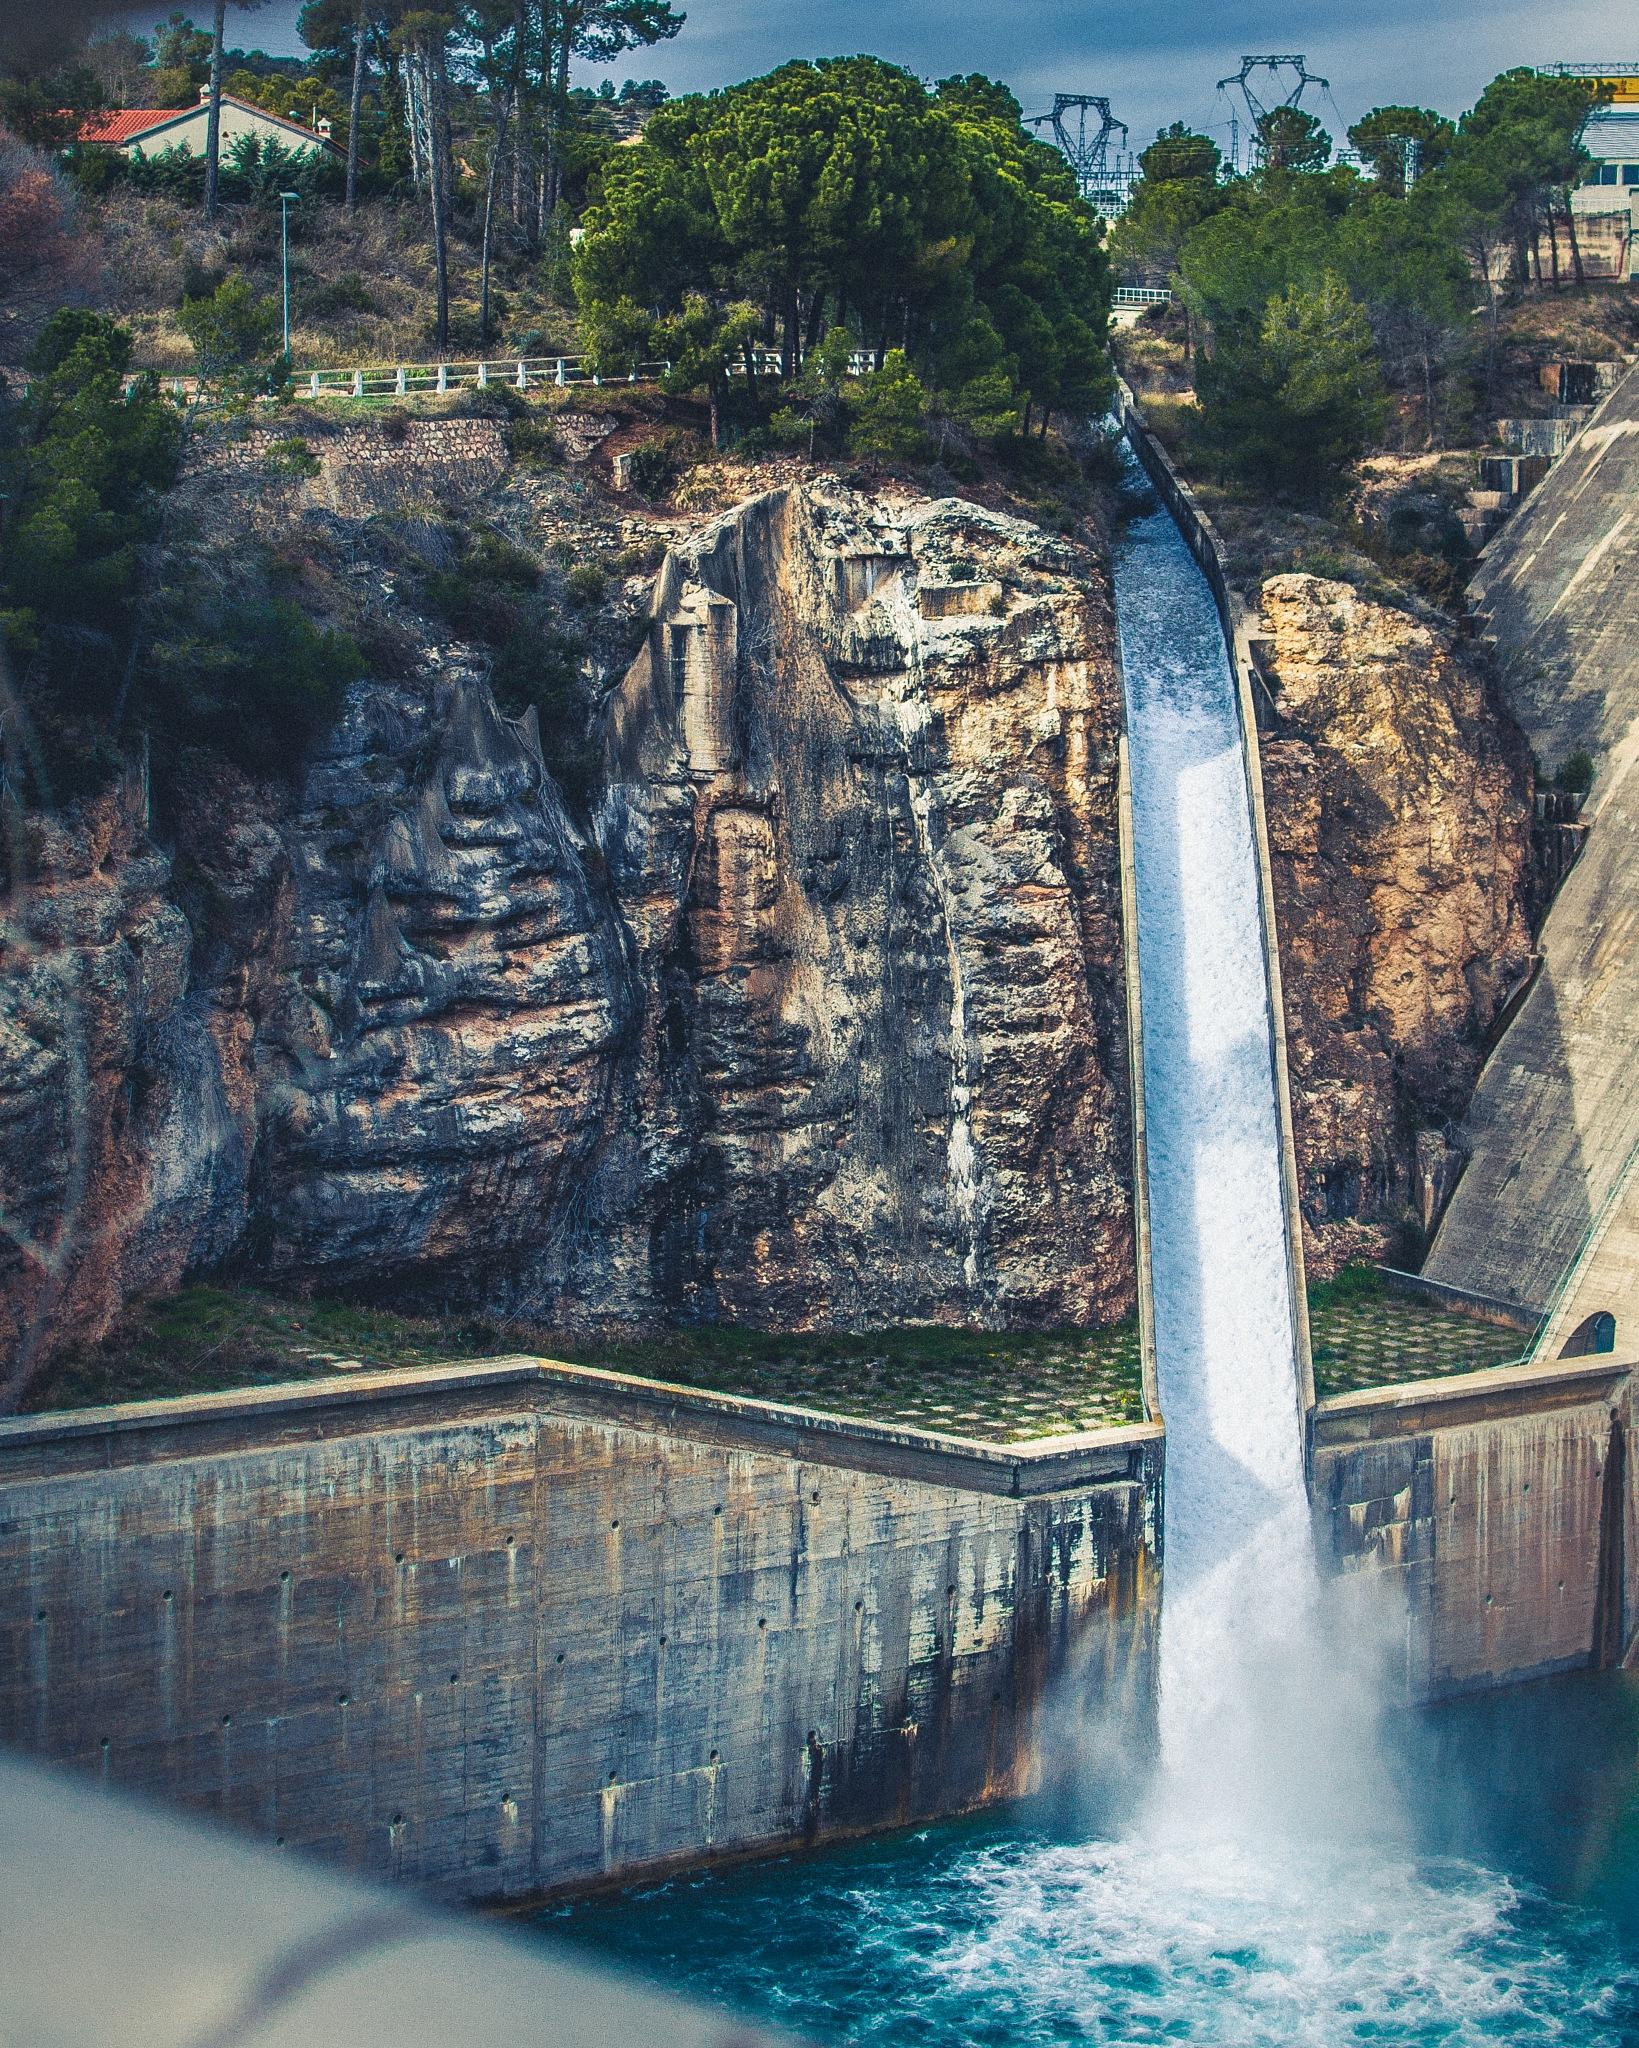 waterfall by pedro_polska